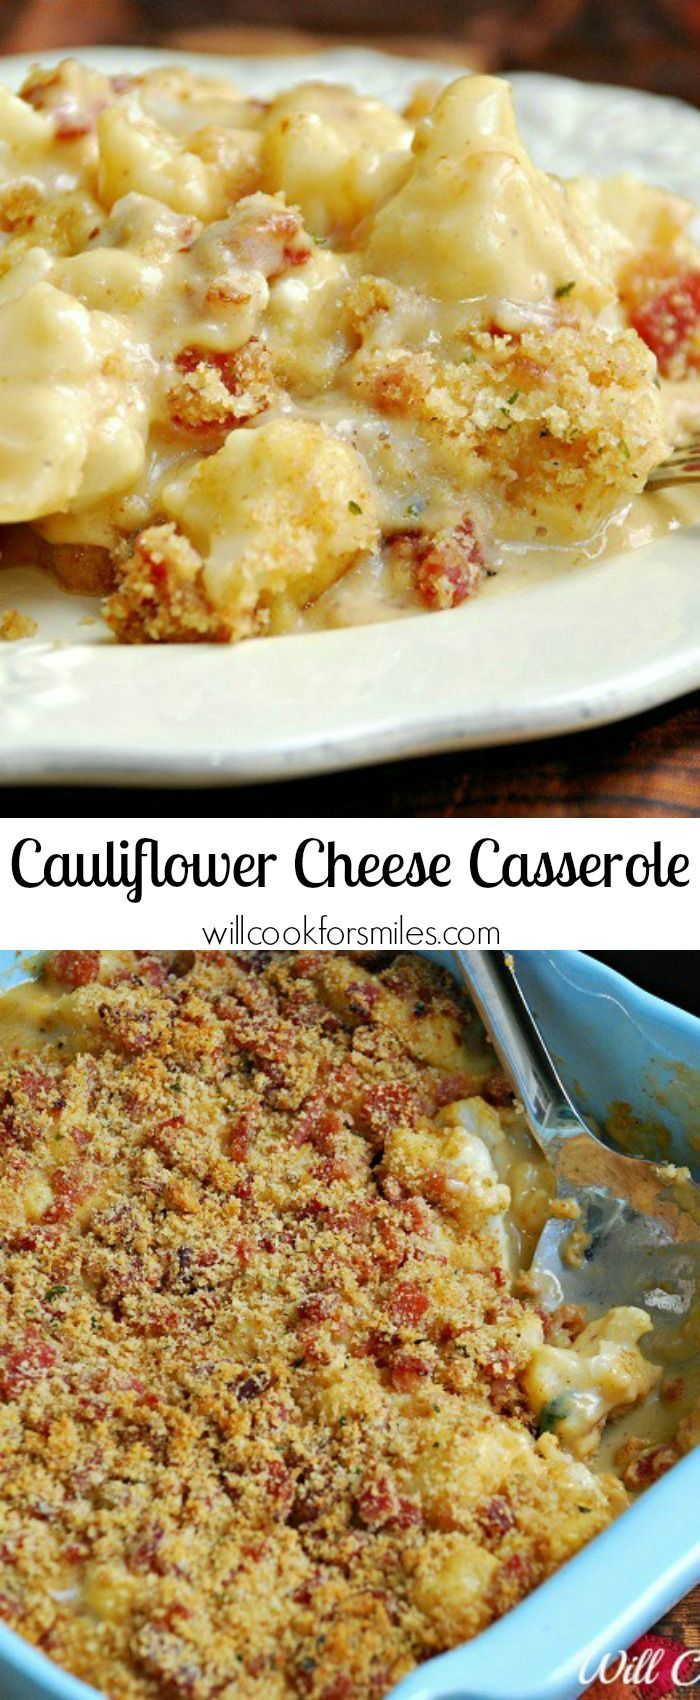 Cauliflower Cheese Casserole | from willcookforsmiles.com #sidedish #sides #comfortfood